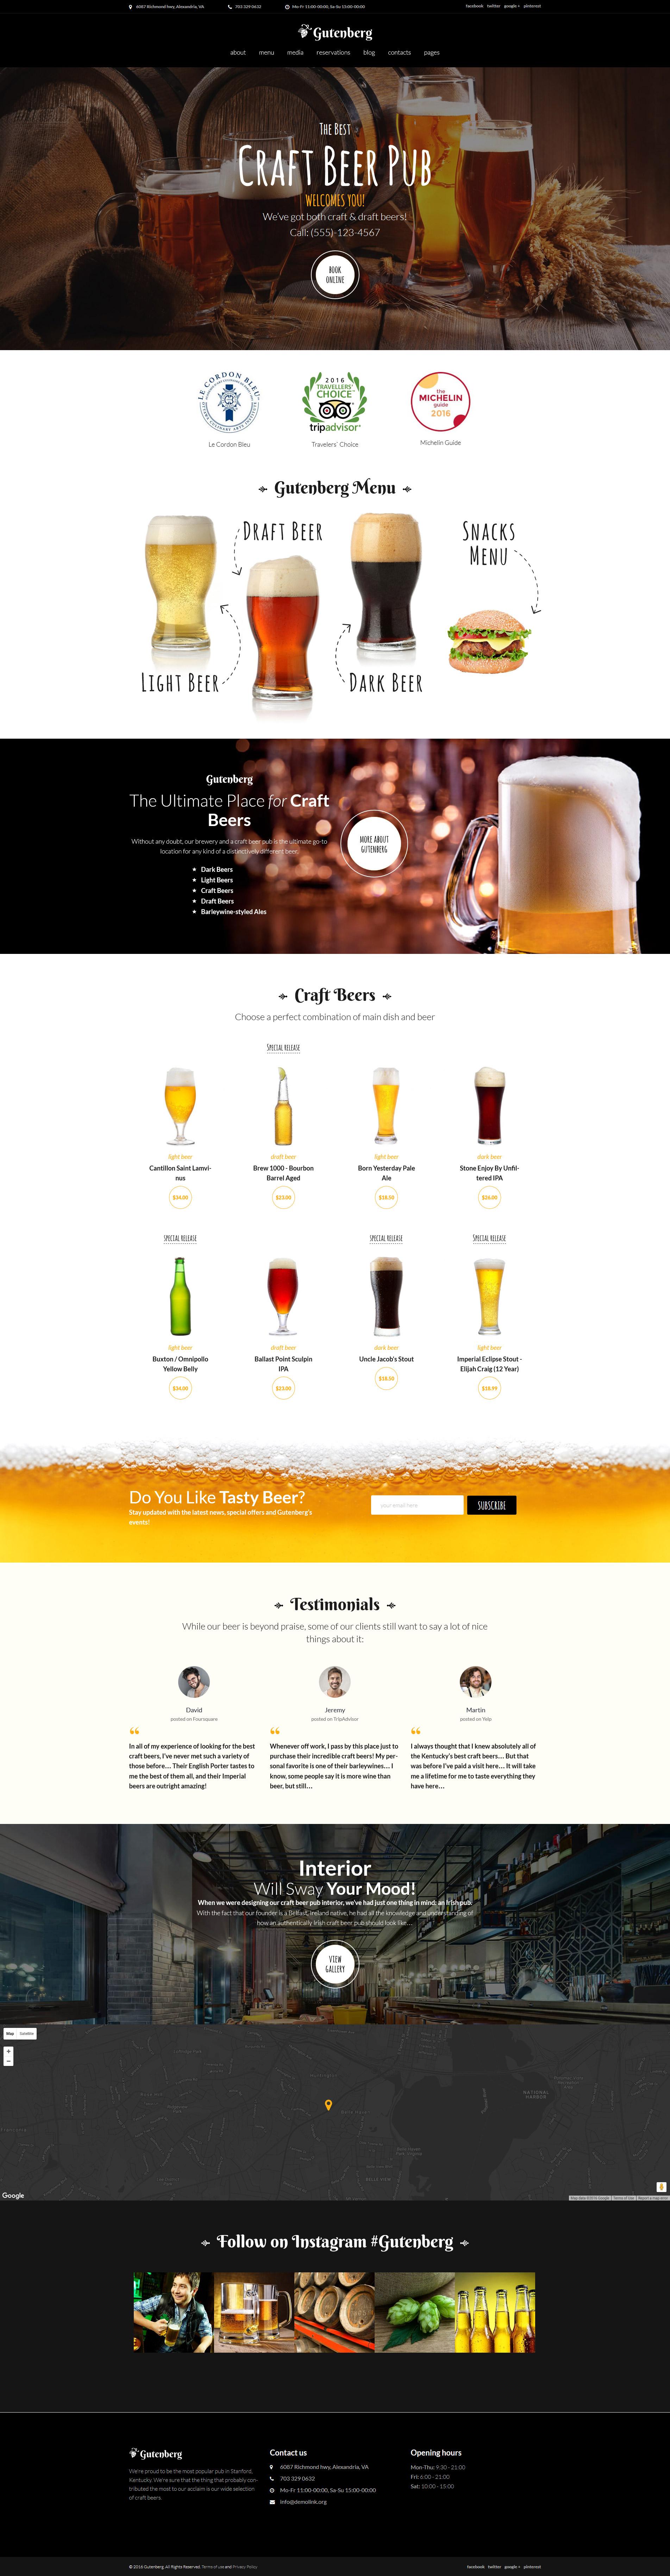 """GutenBerg - Beer Pub and Brewery"" WordPress thema №59005"